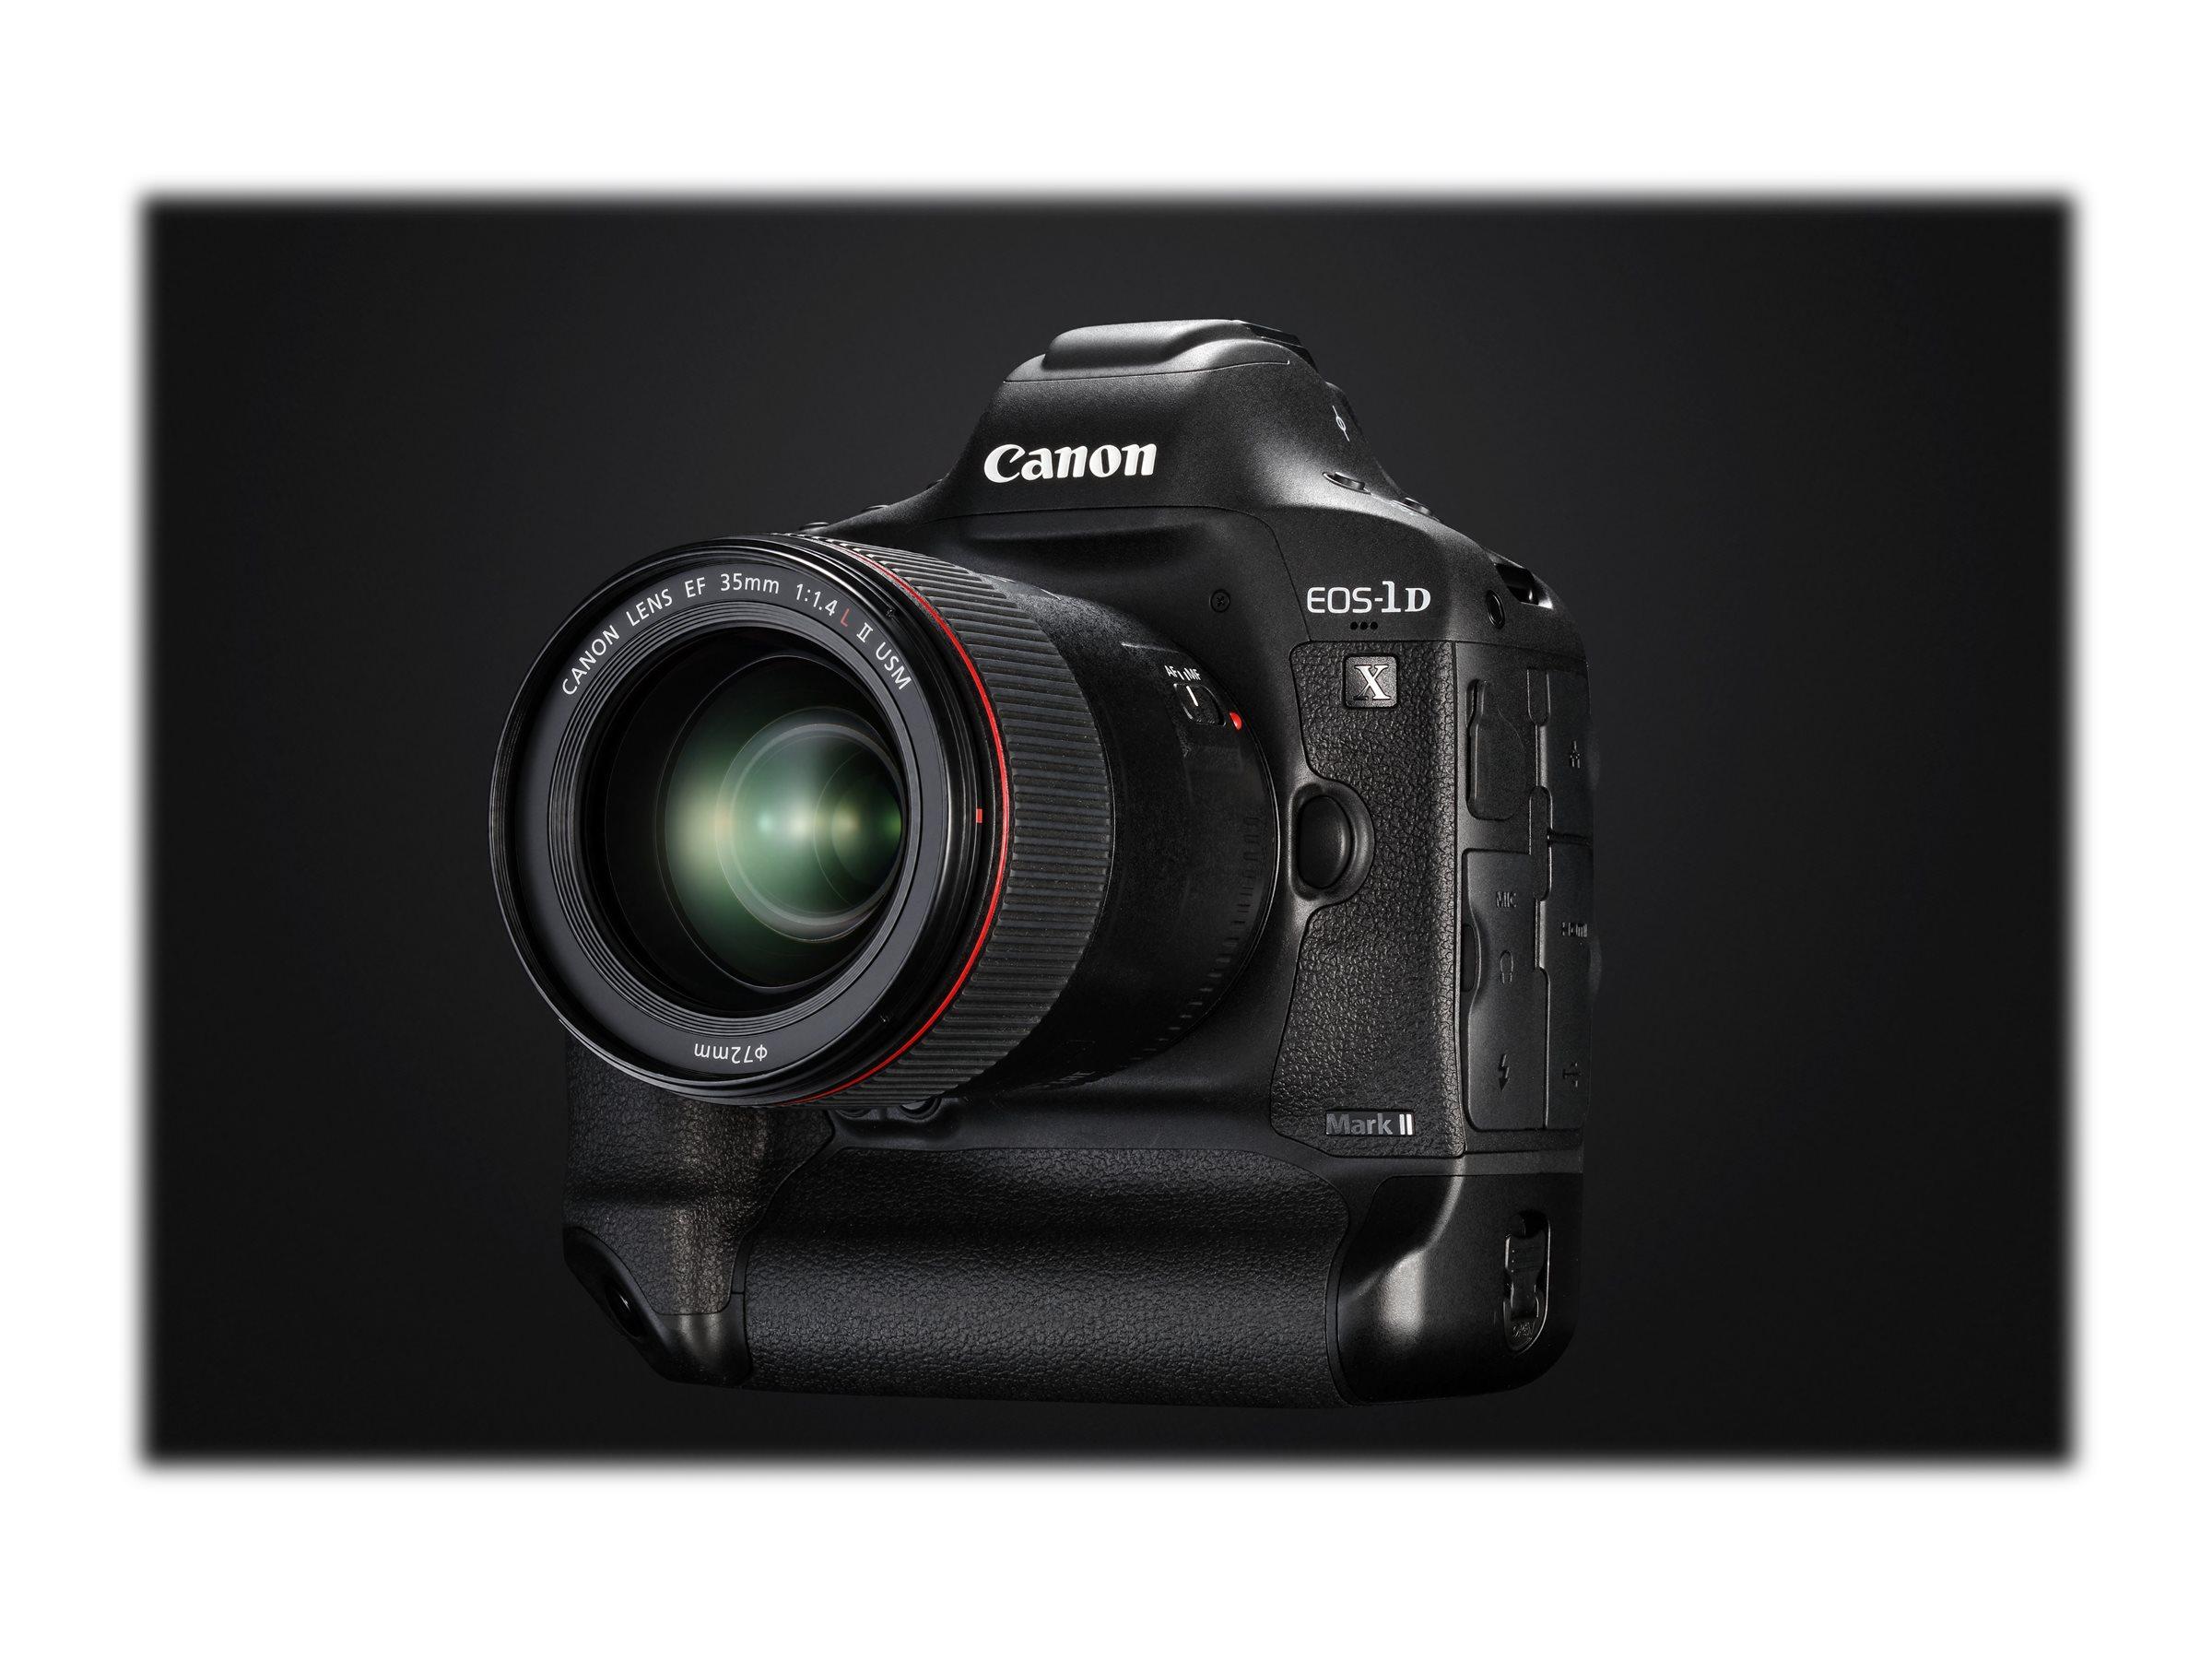 Canon EOS-1D X Mark II DSLR Camera (Body Only), 0931C002, 32547342, Cameras - Digital